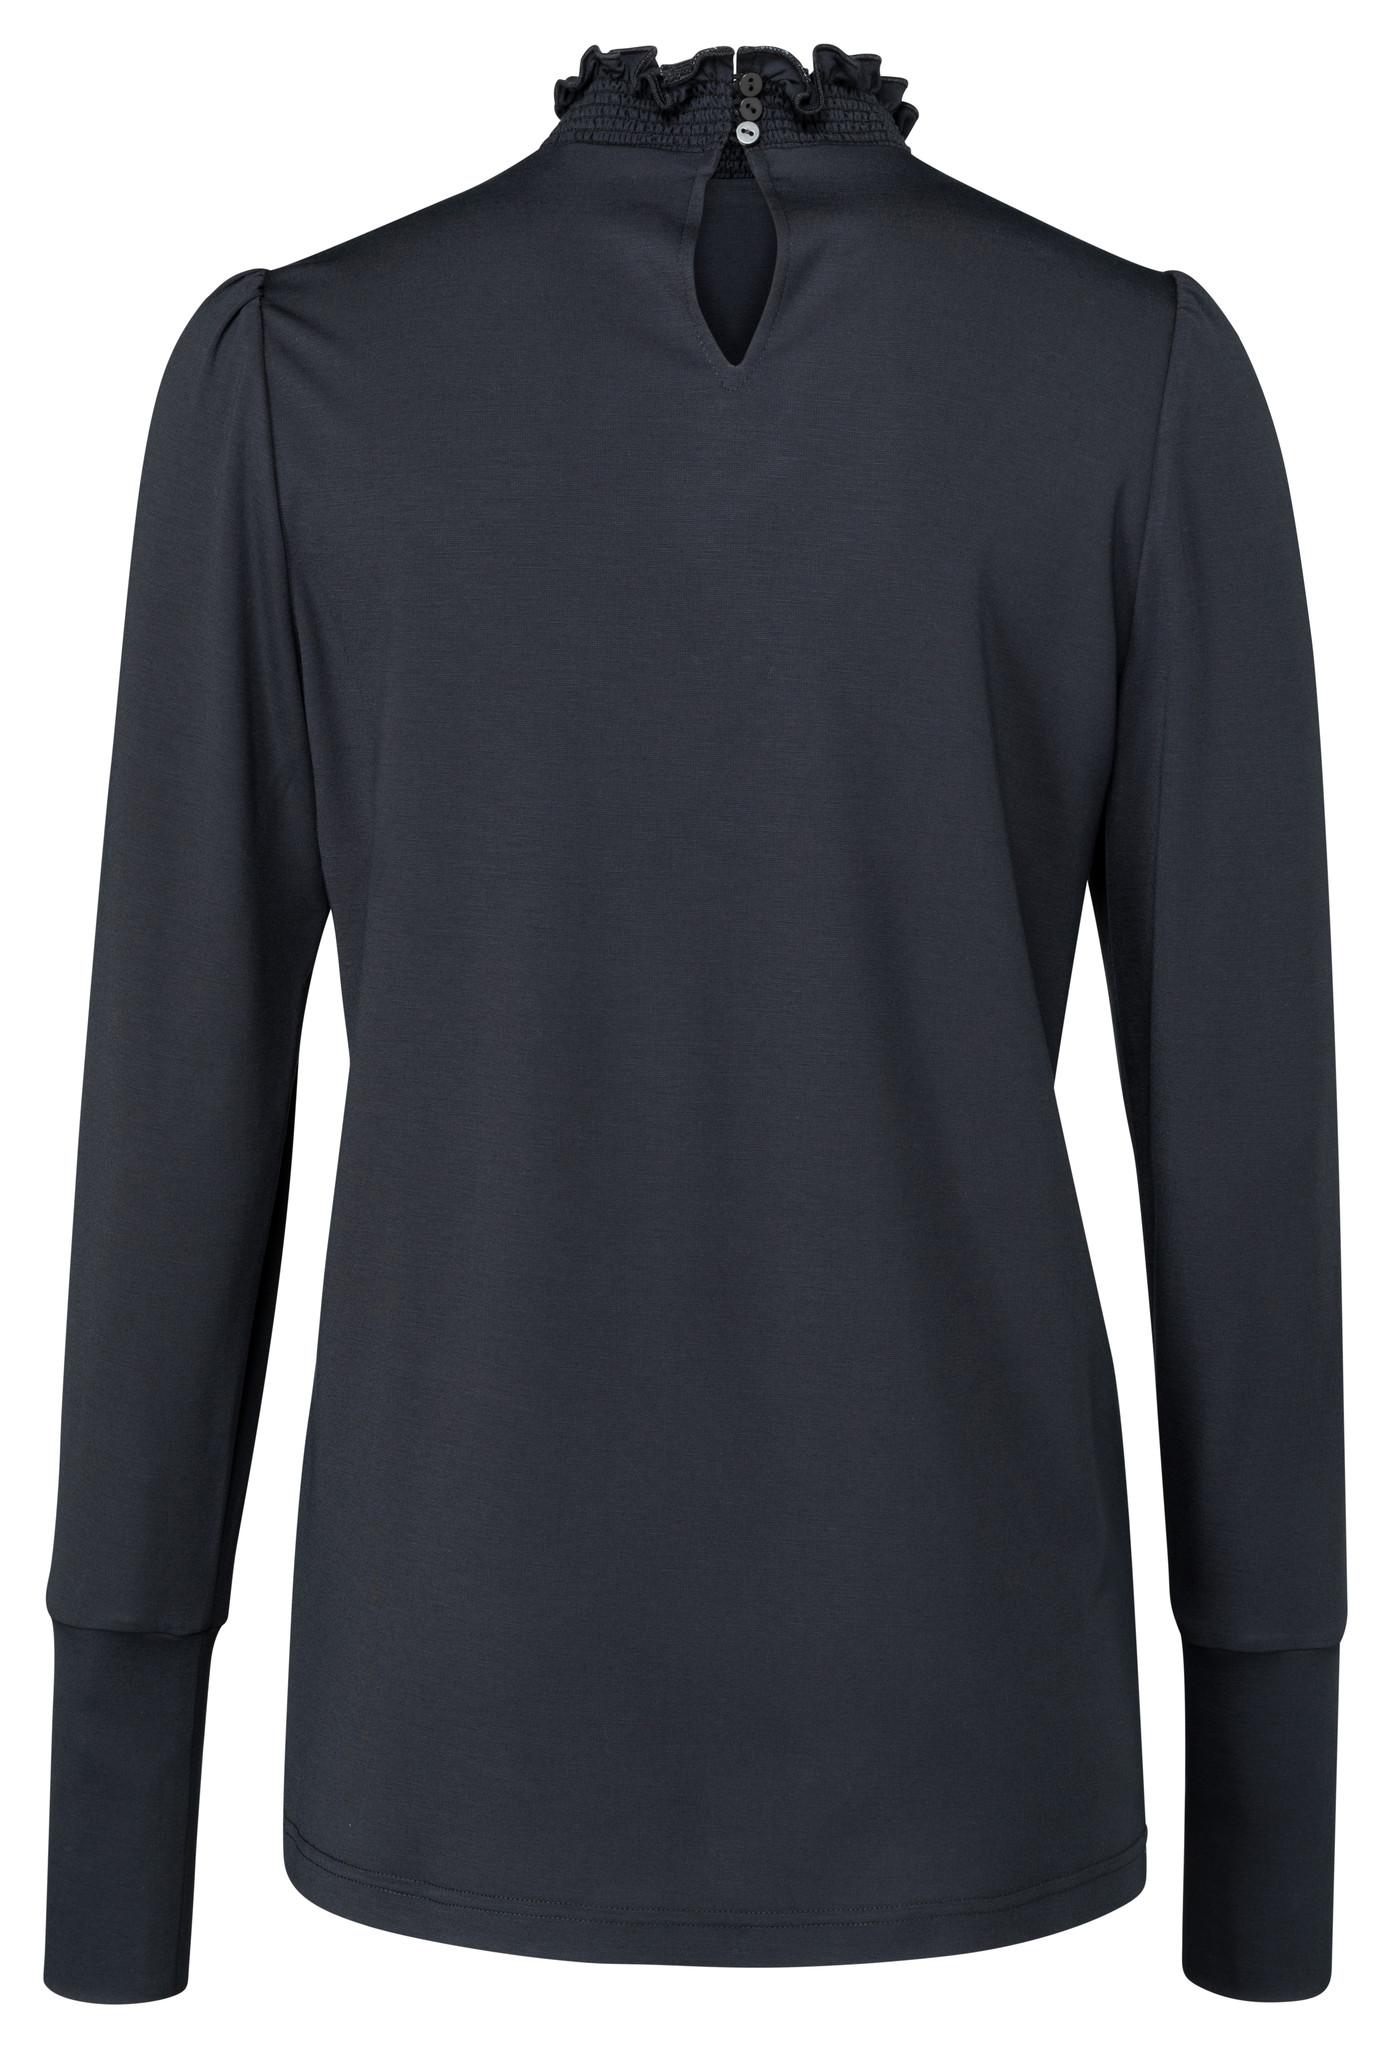 yaya Jersey top with smoc 1909491-124-2